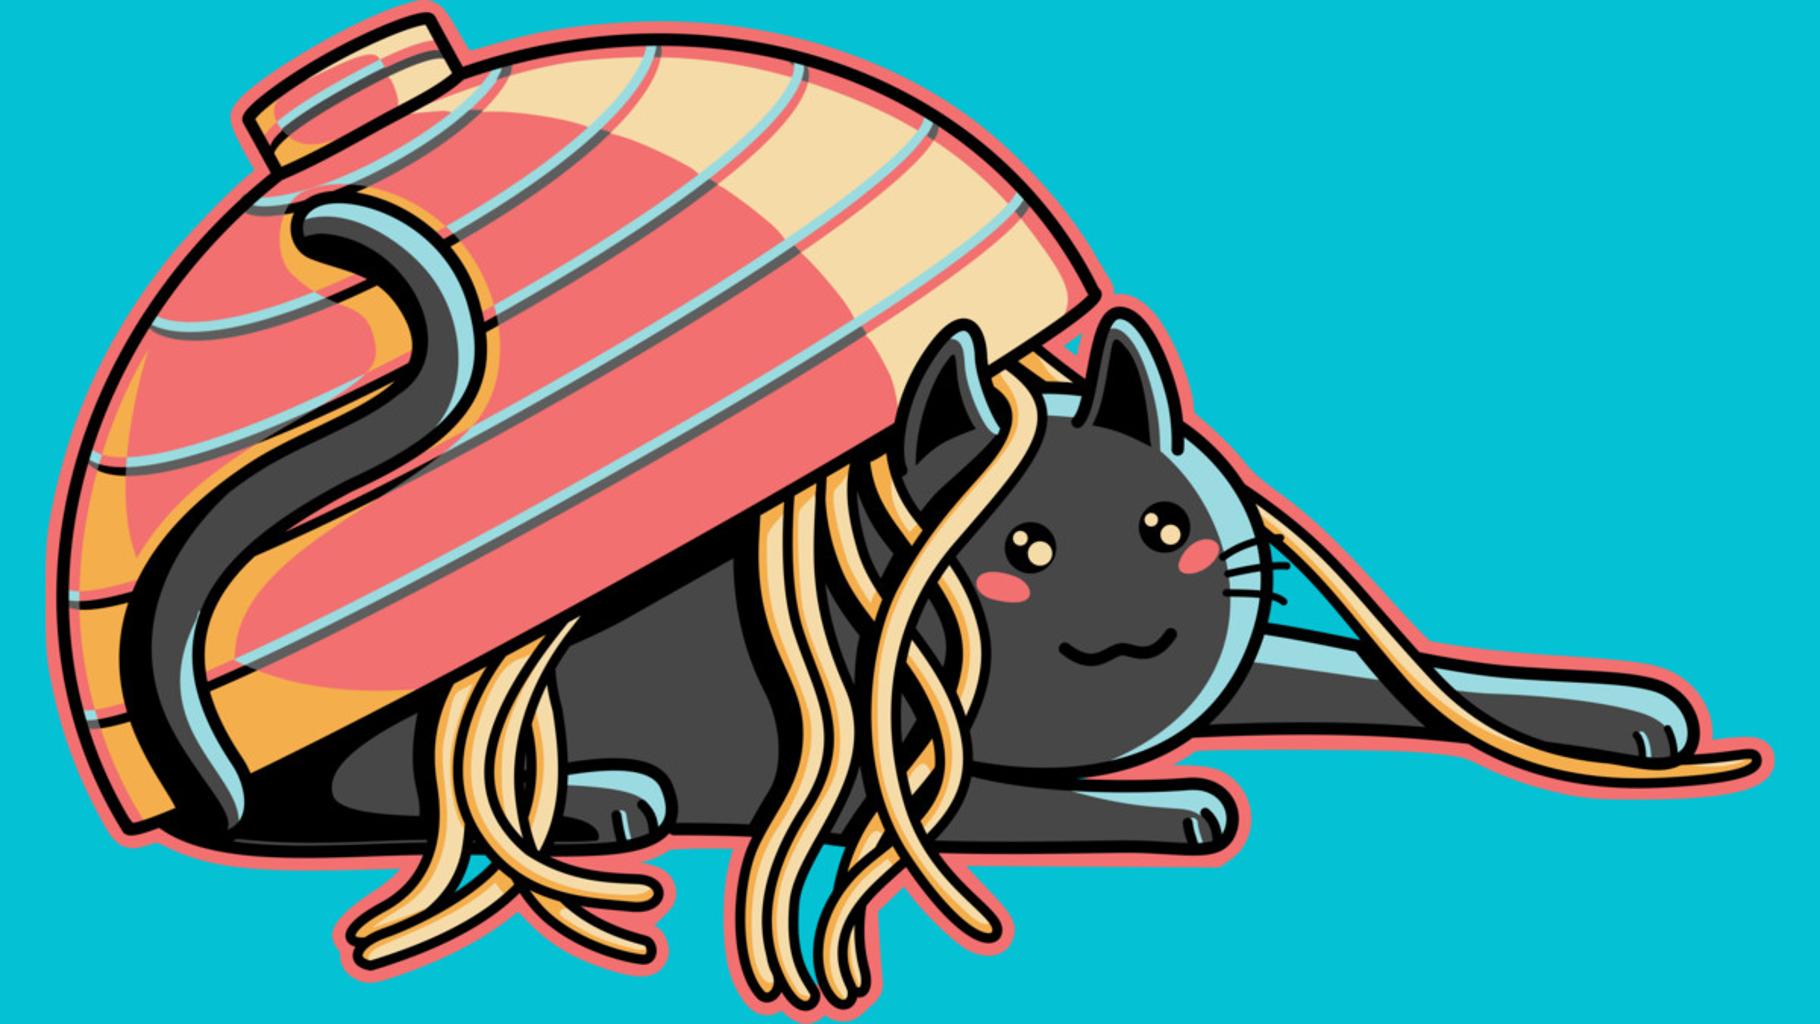 Design by Humans: Ramen Loving Cat